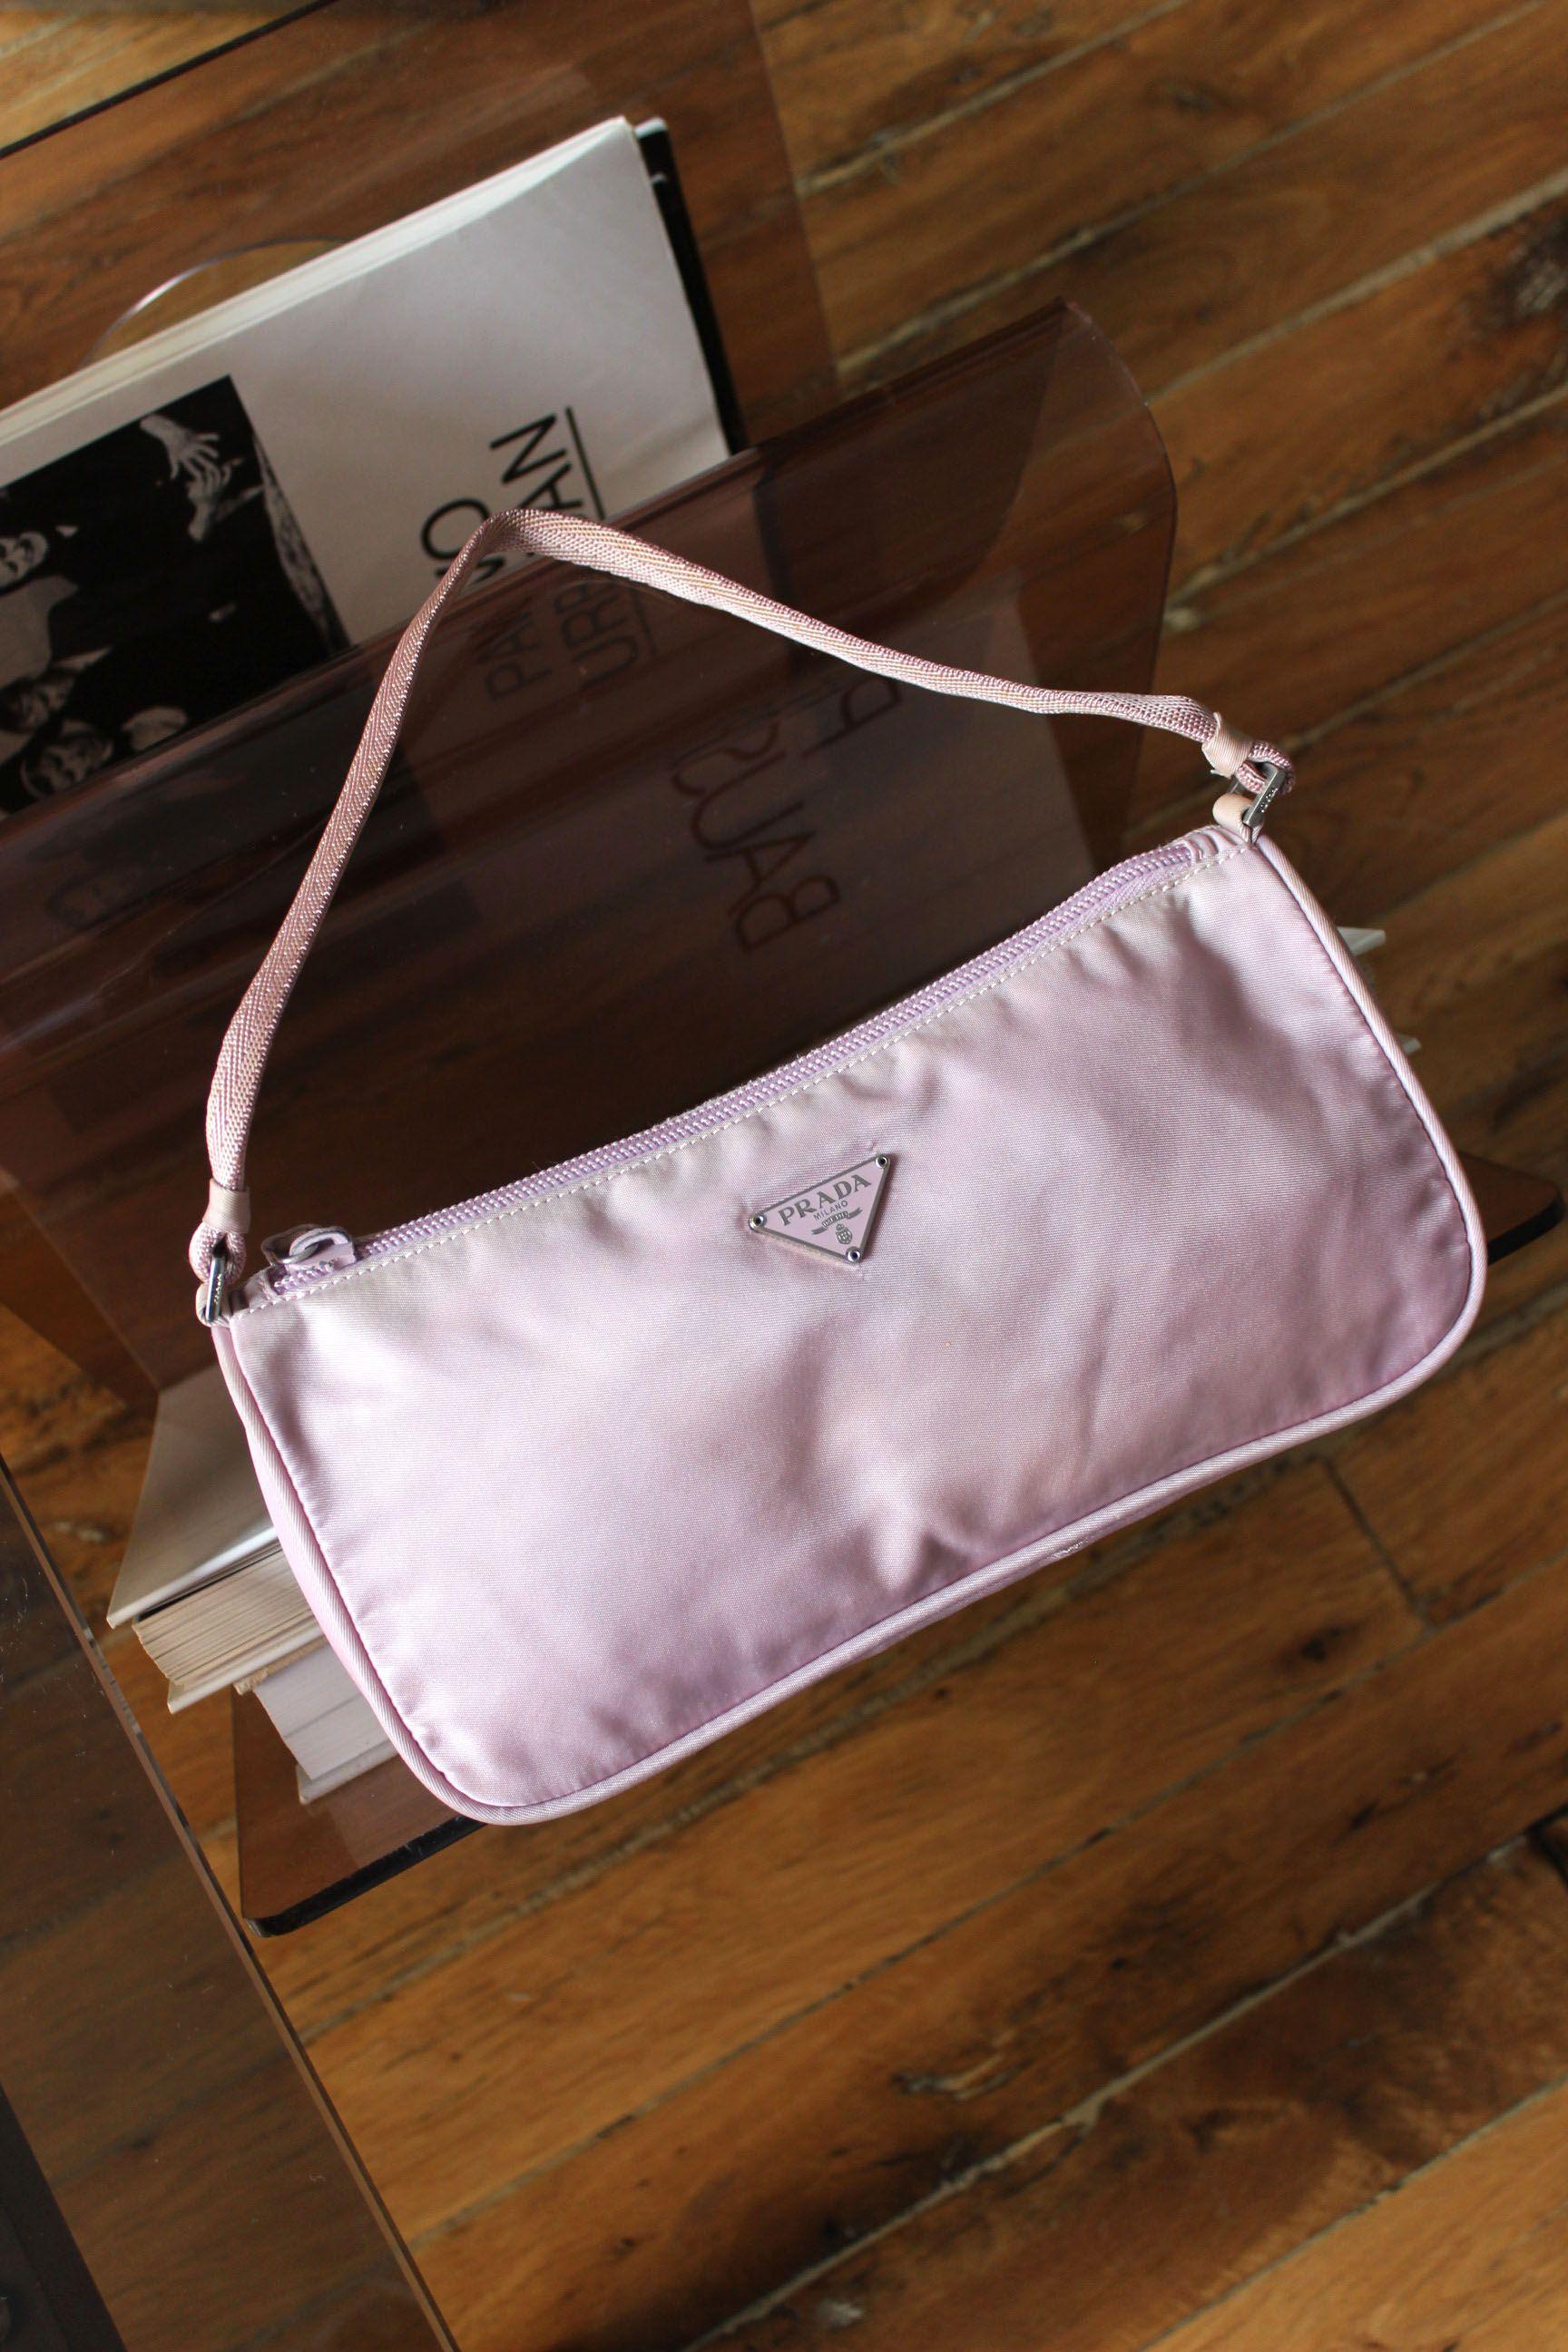 07c0a6cc6812 Instagram; kardelennozturk Pinterest; kardelennozturk Nylon Bag, Prada Bag,  Vintage Bags, Baguette